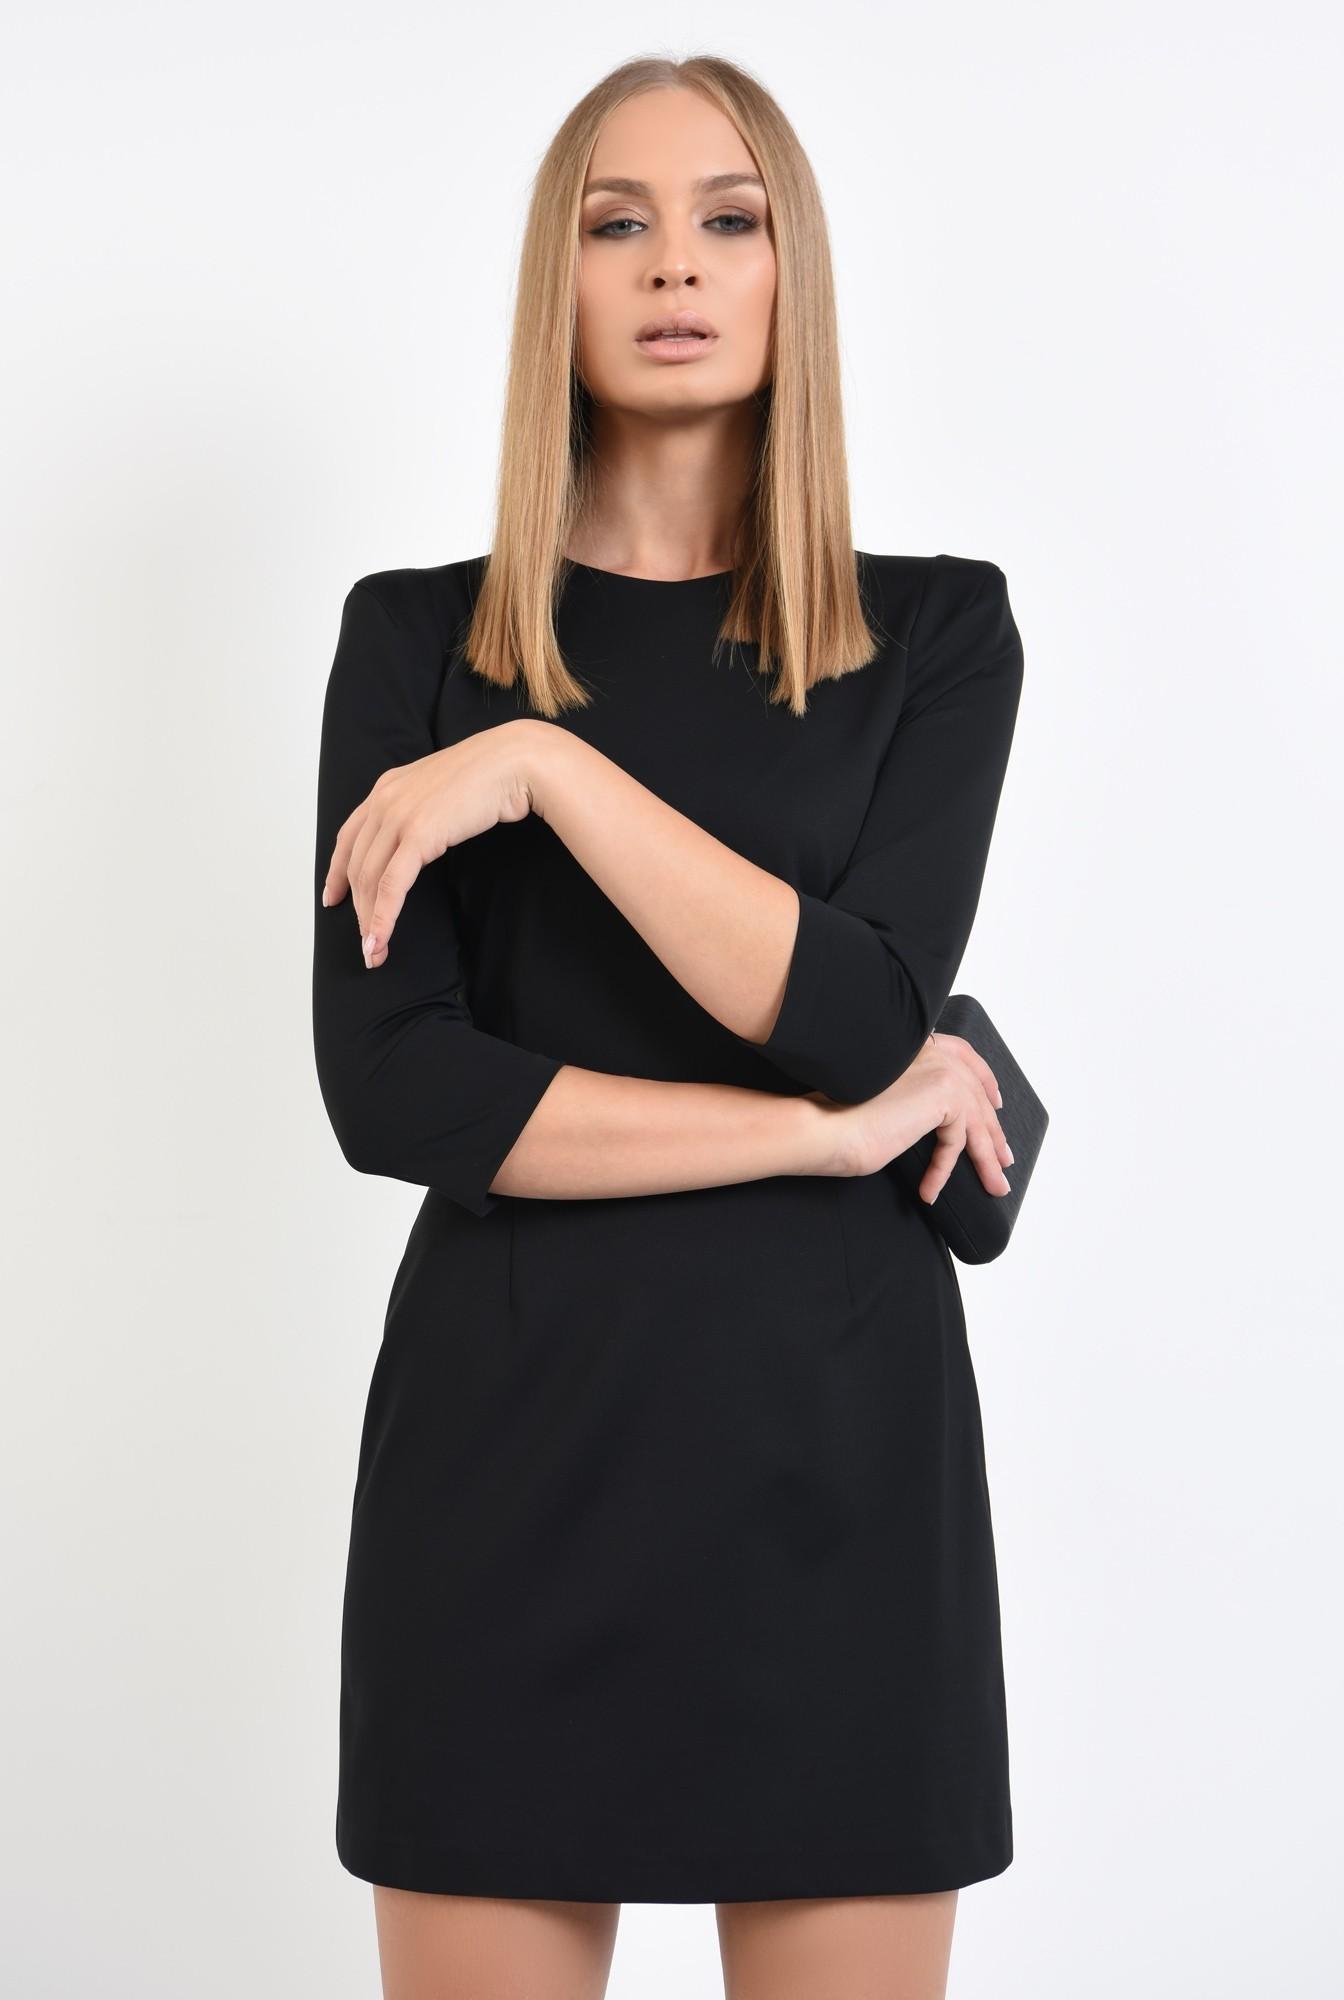 2 - 360 - rochie mini, neagra, maneci 3/4, croi usor evazat